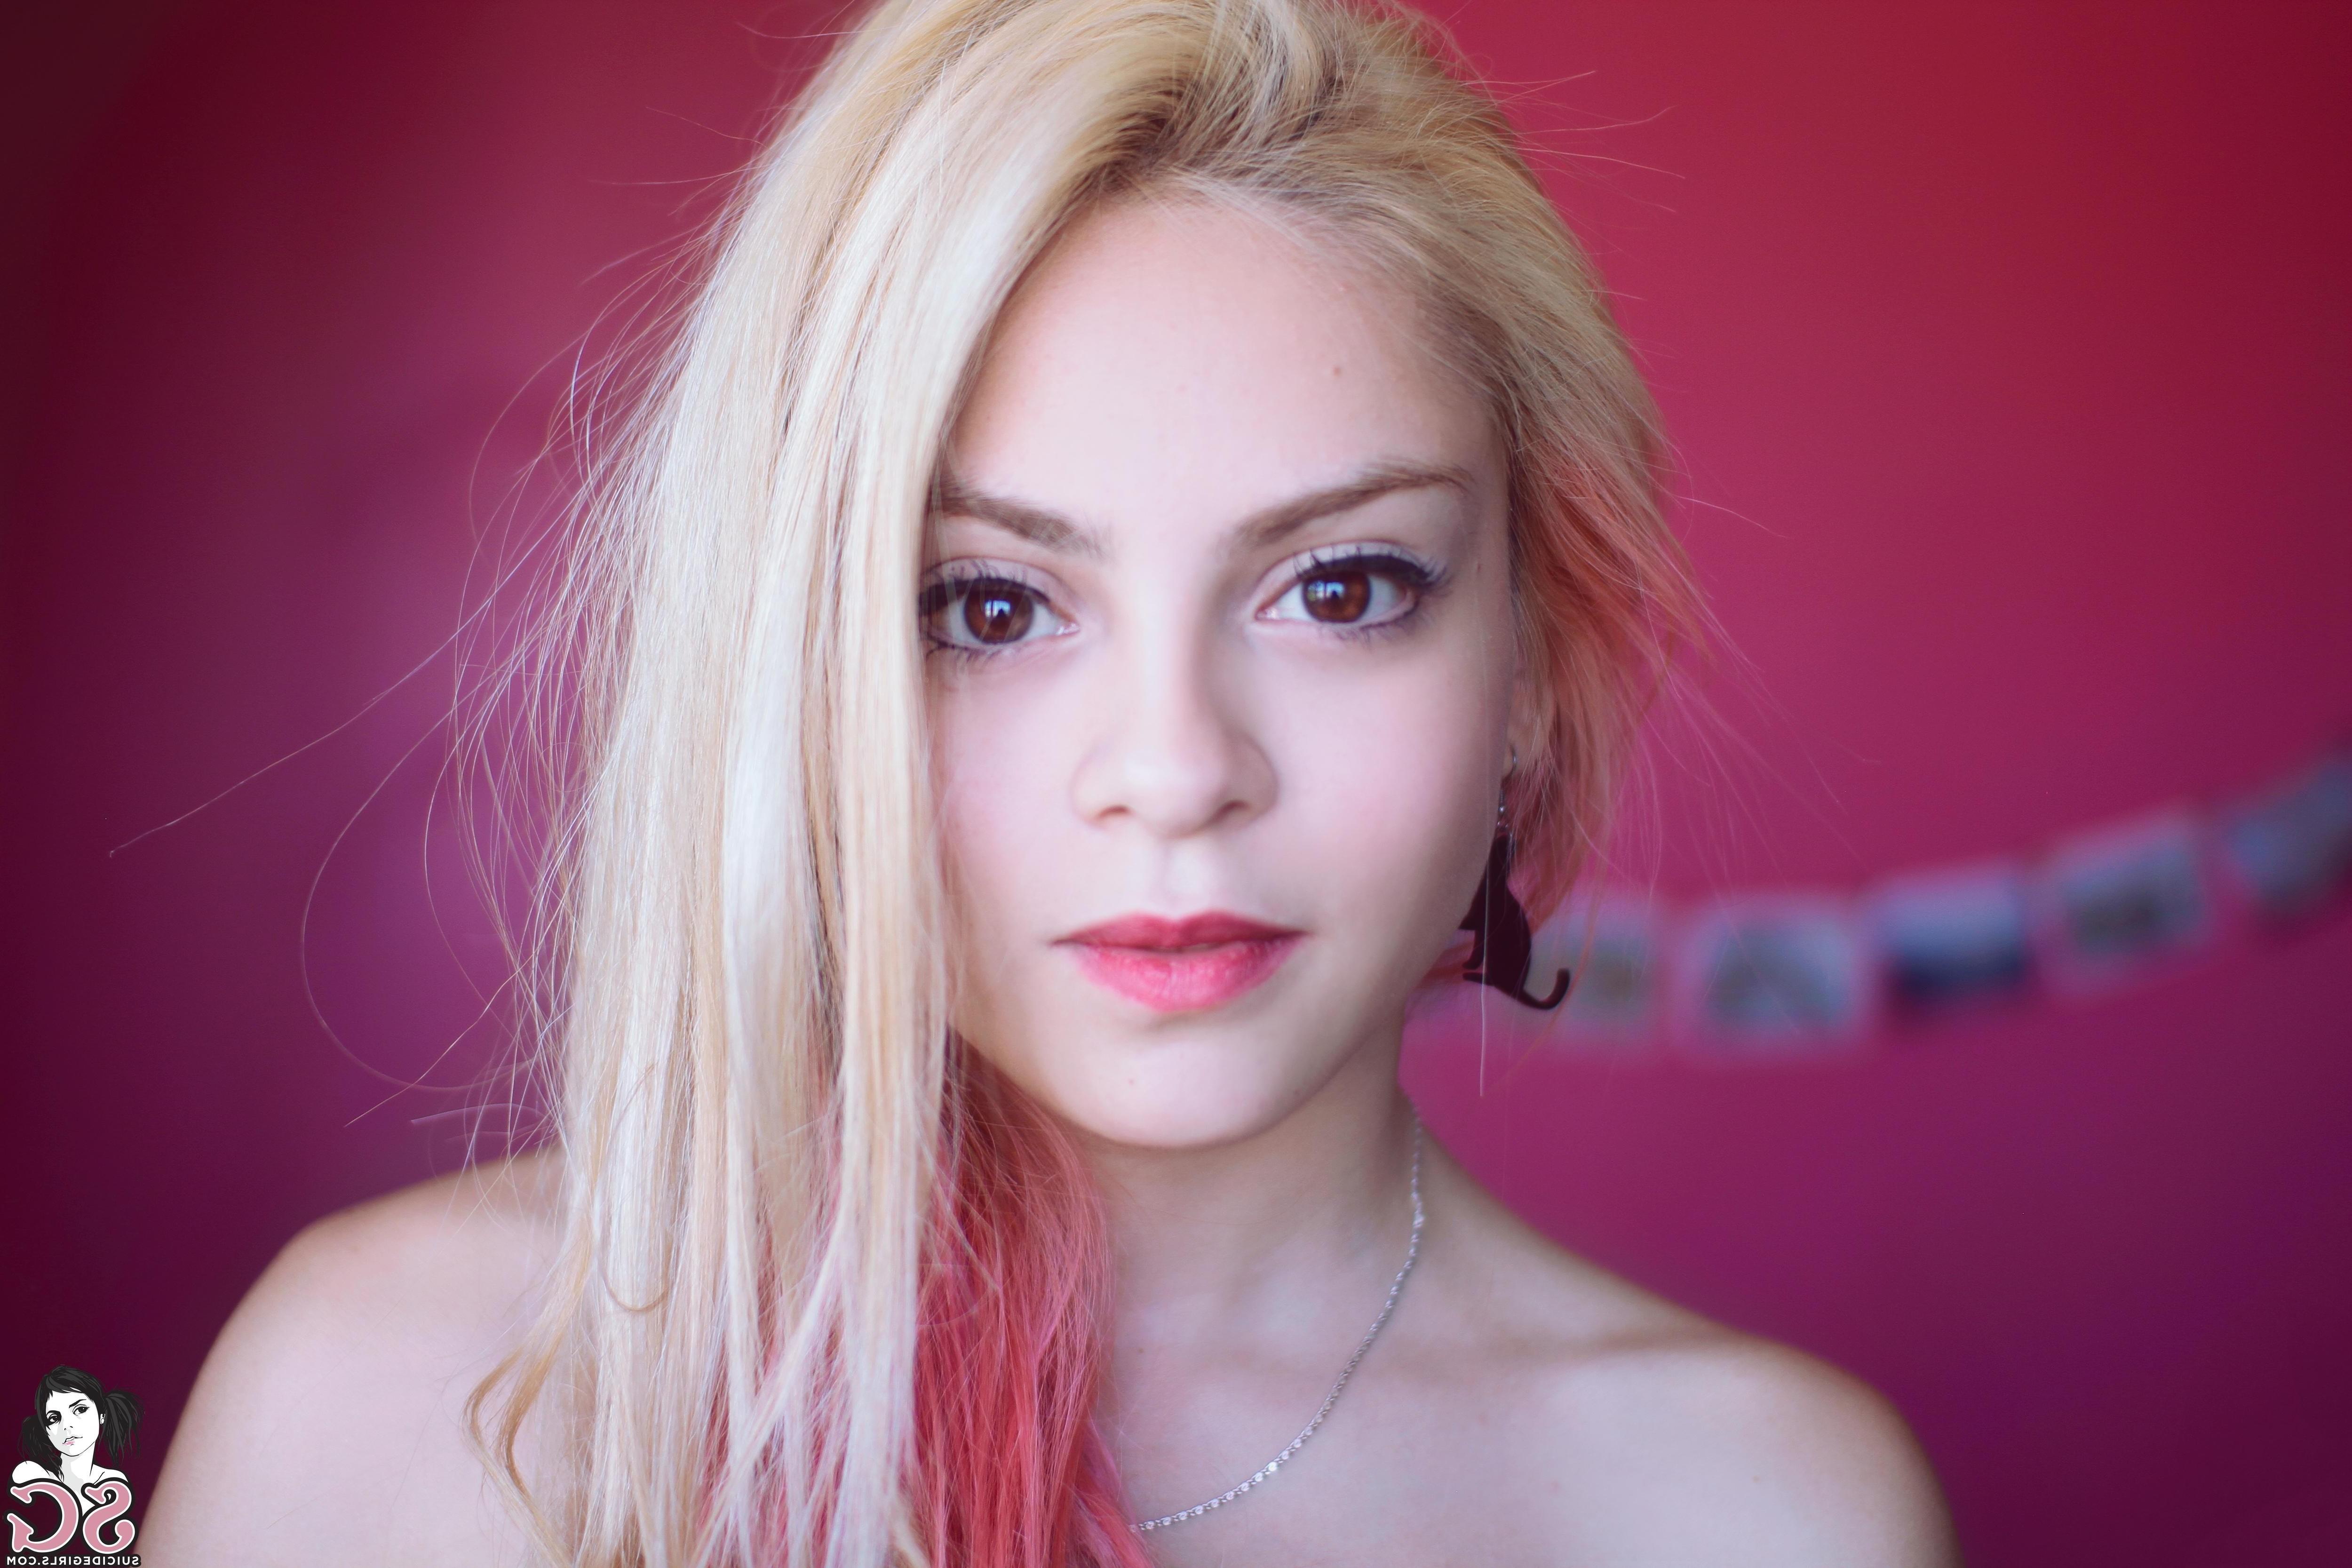 Wallpaper  5000X3333 Px, Blonde, Nude, Suicide Girls -2413